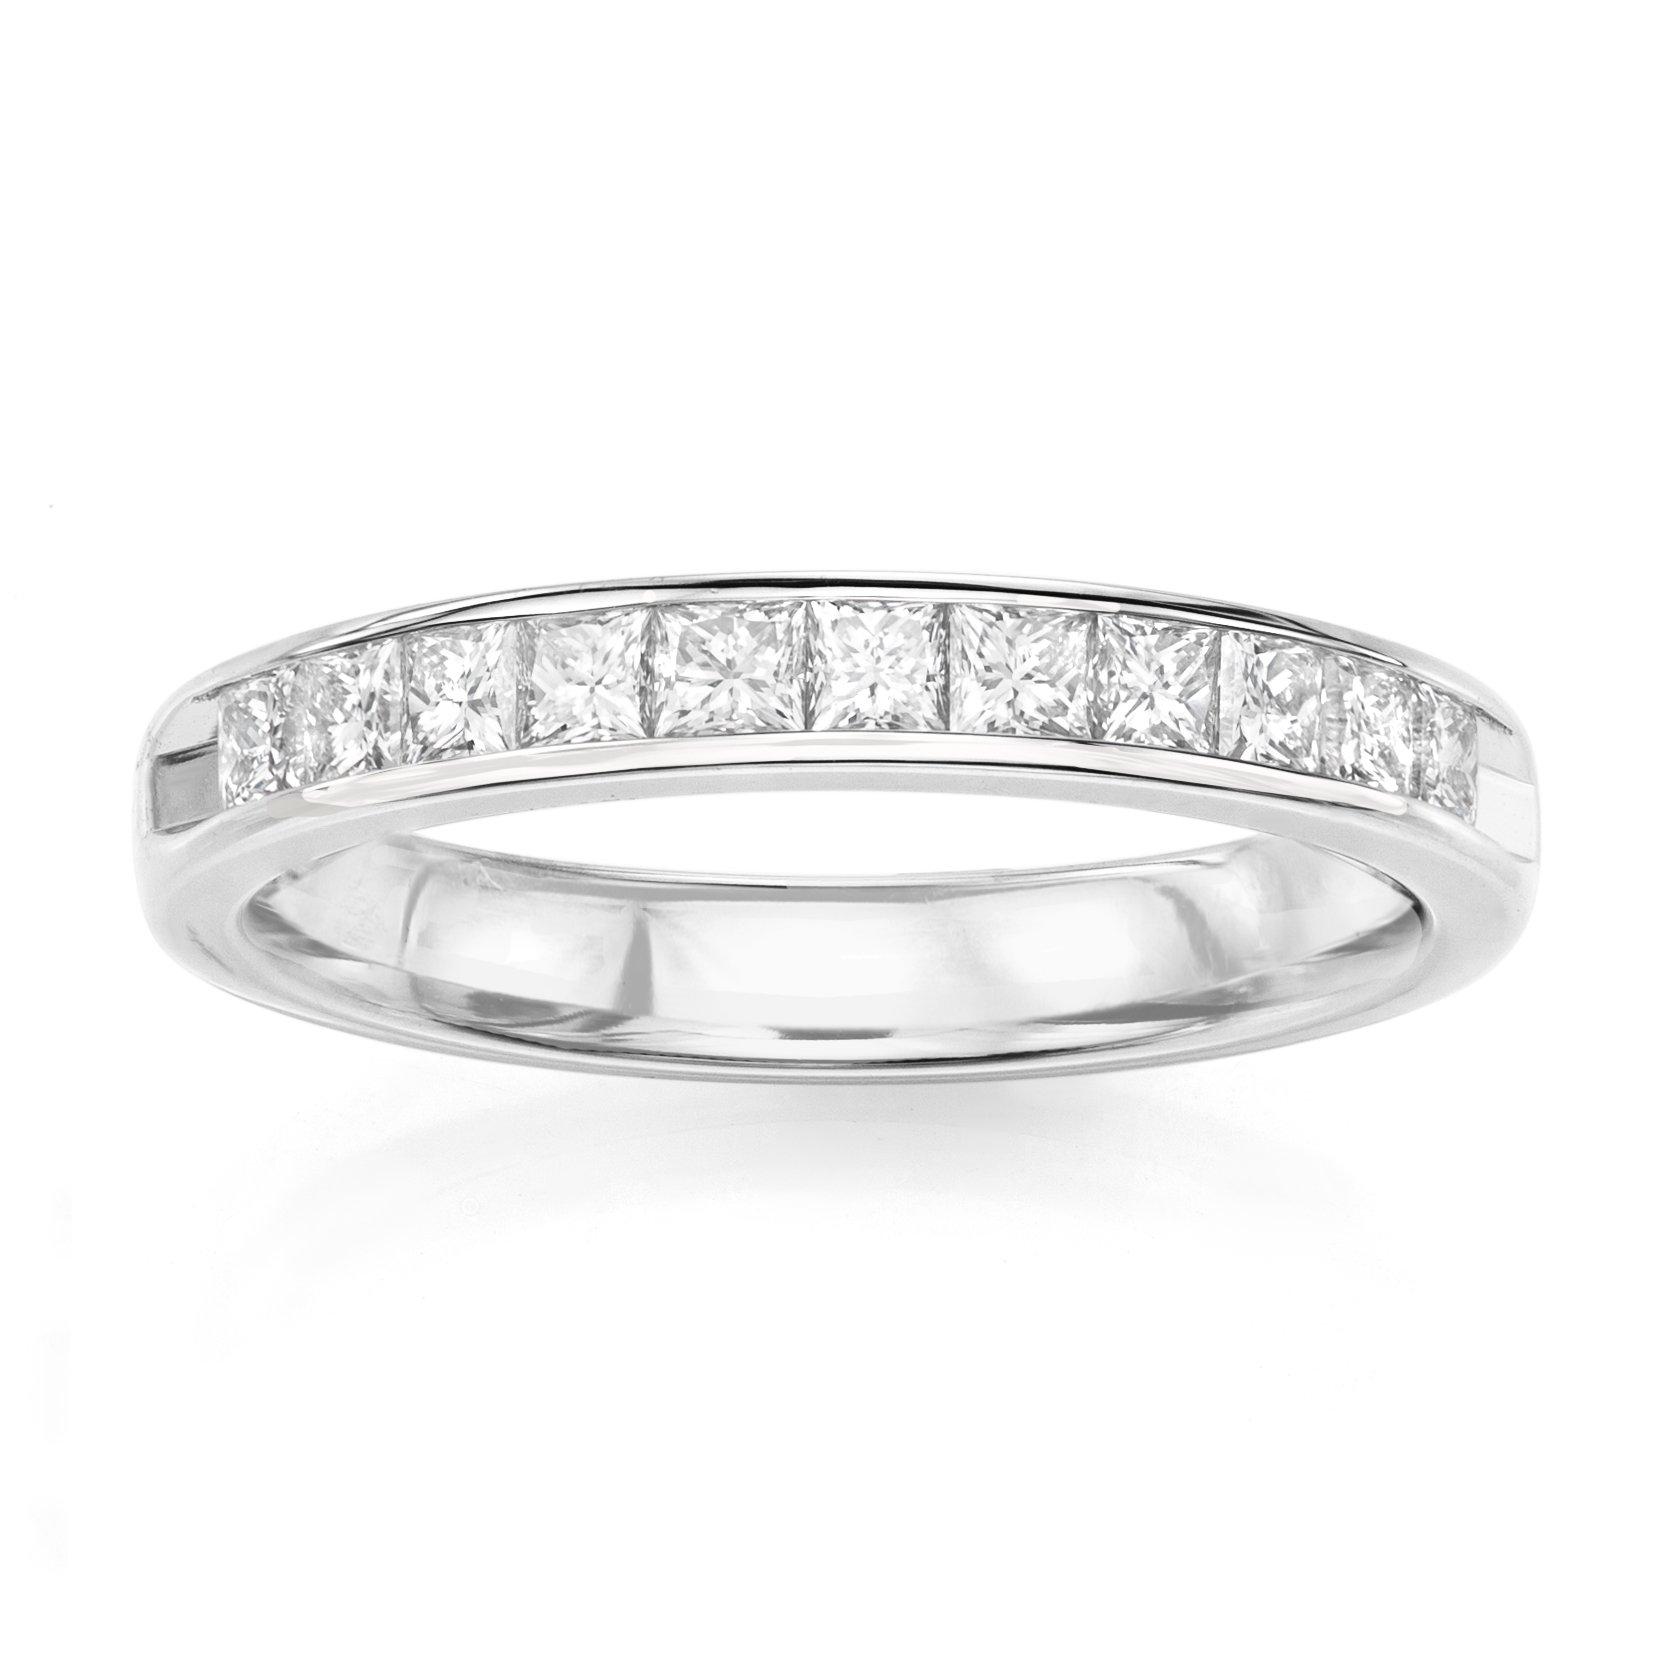 14KT White Gold 0.34ct G-I SI1/SI2 Channel Machine Set Wedding Ring